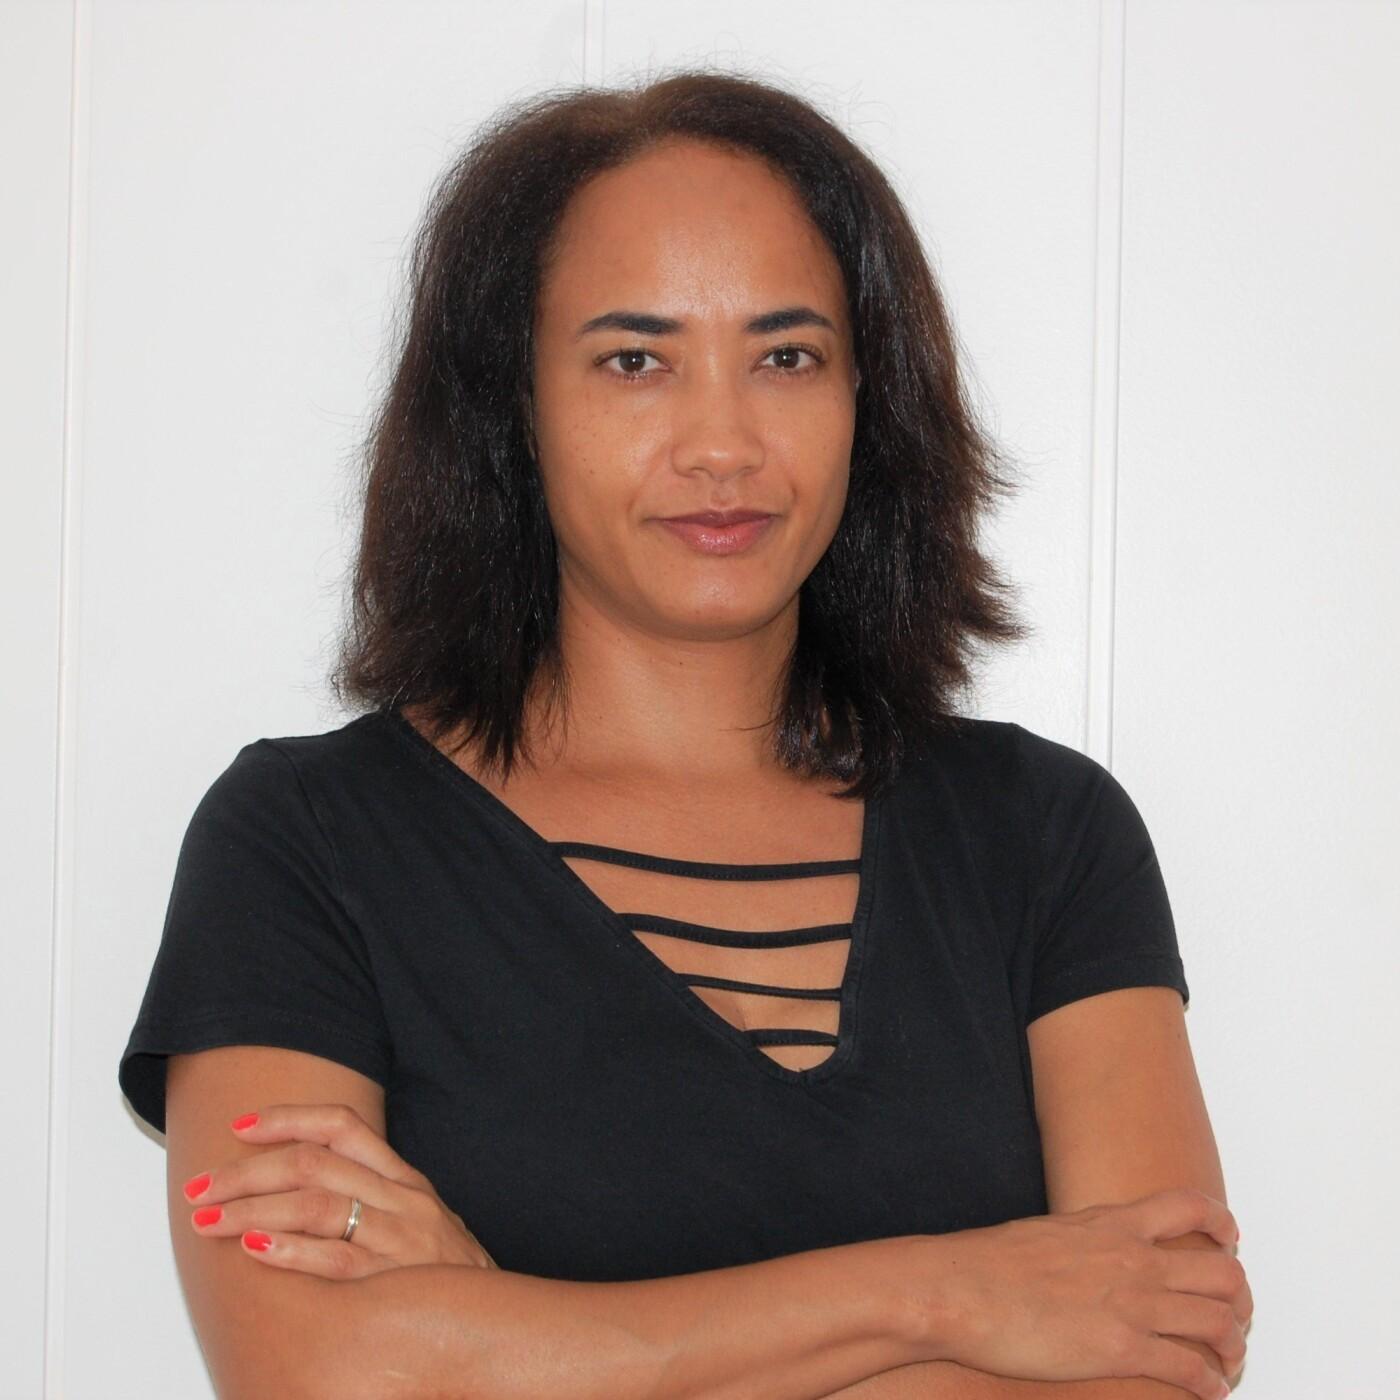 Sibylle est conseillere d orientation a Rio, Brésil - 09 07 2021 - StereoChic Radio